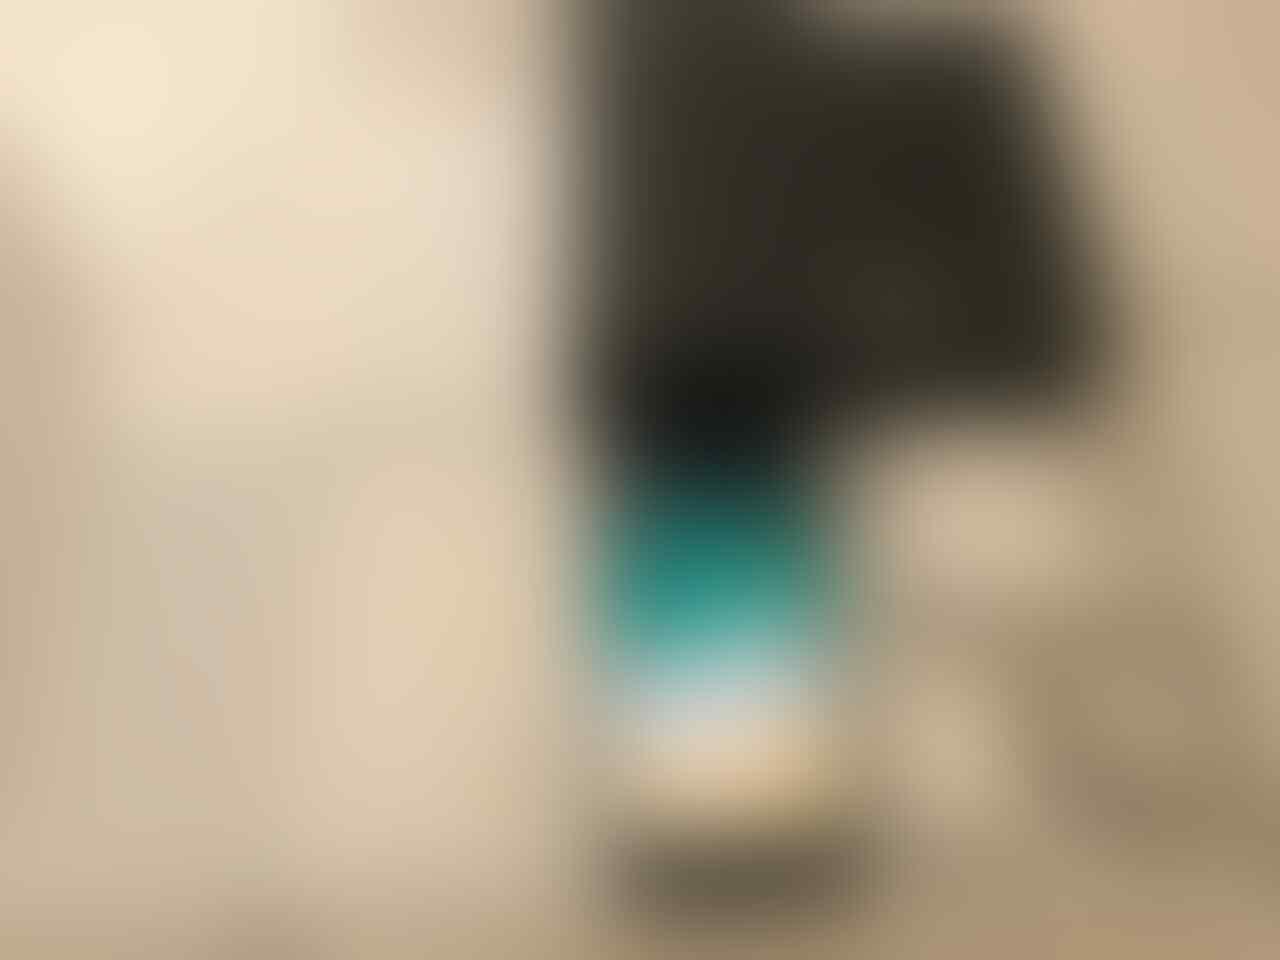 IPHONE 7 PLUS JETBLACK 256GB FULLSET FULL ORI MULUUSS MURAAHH 9200 SAJA [MALANG]